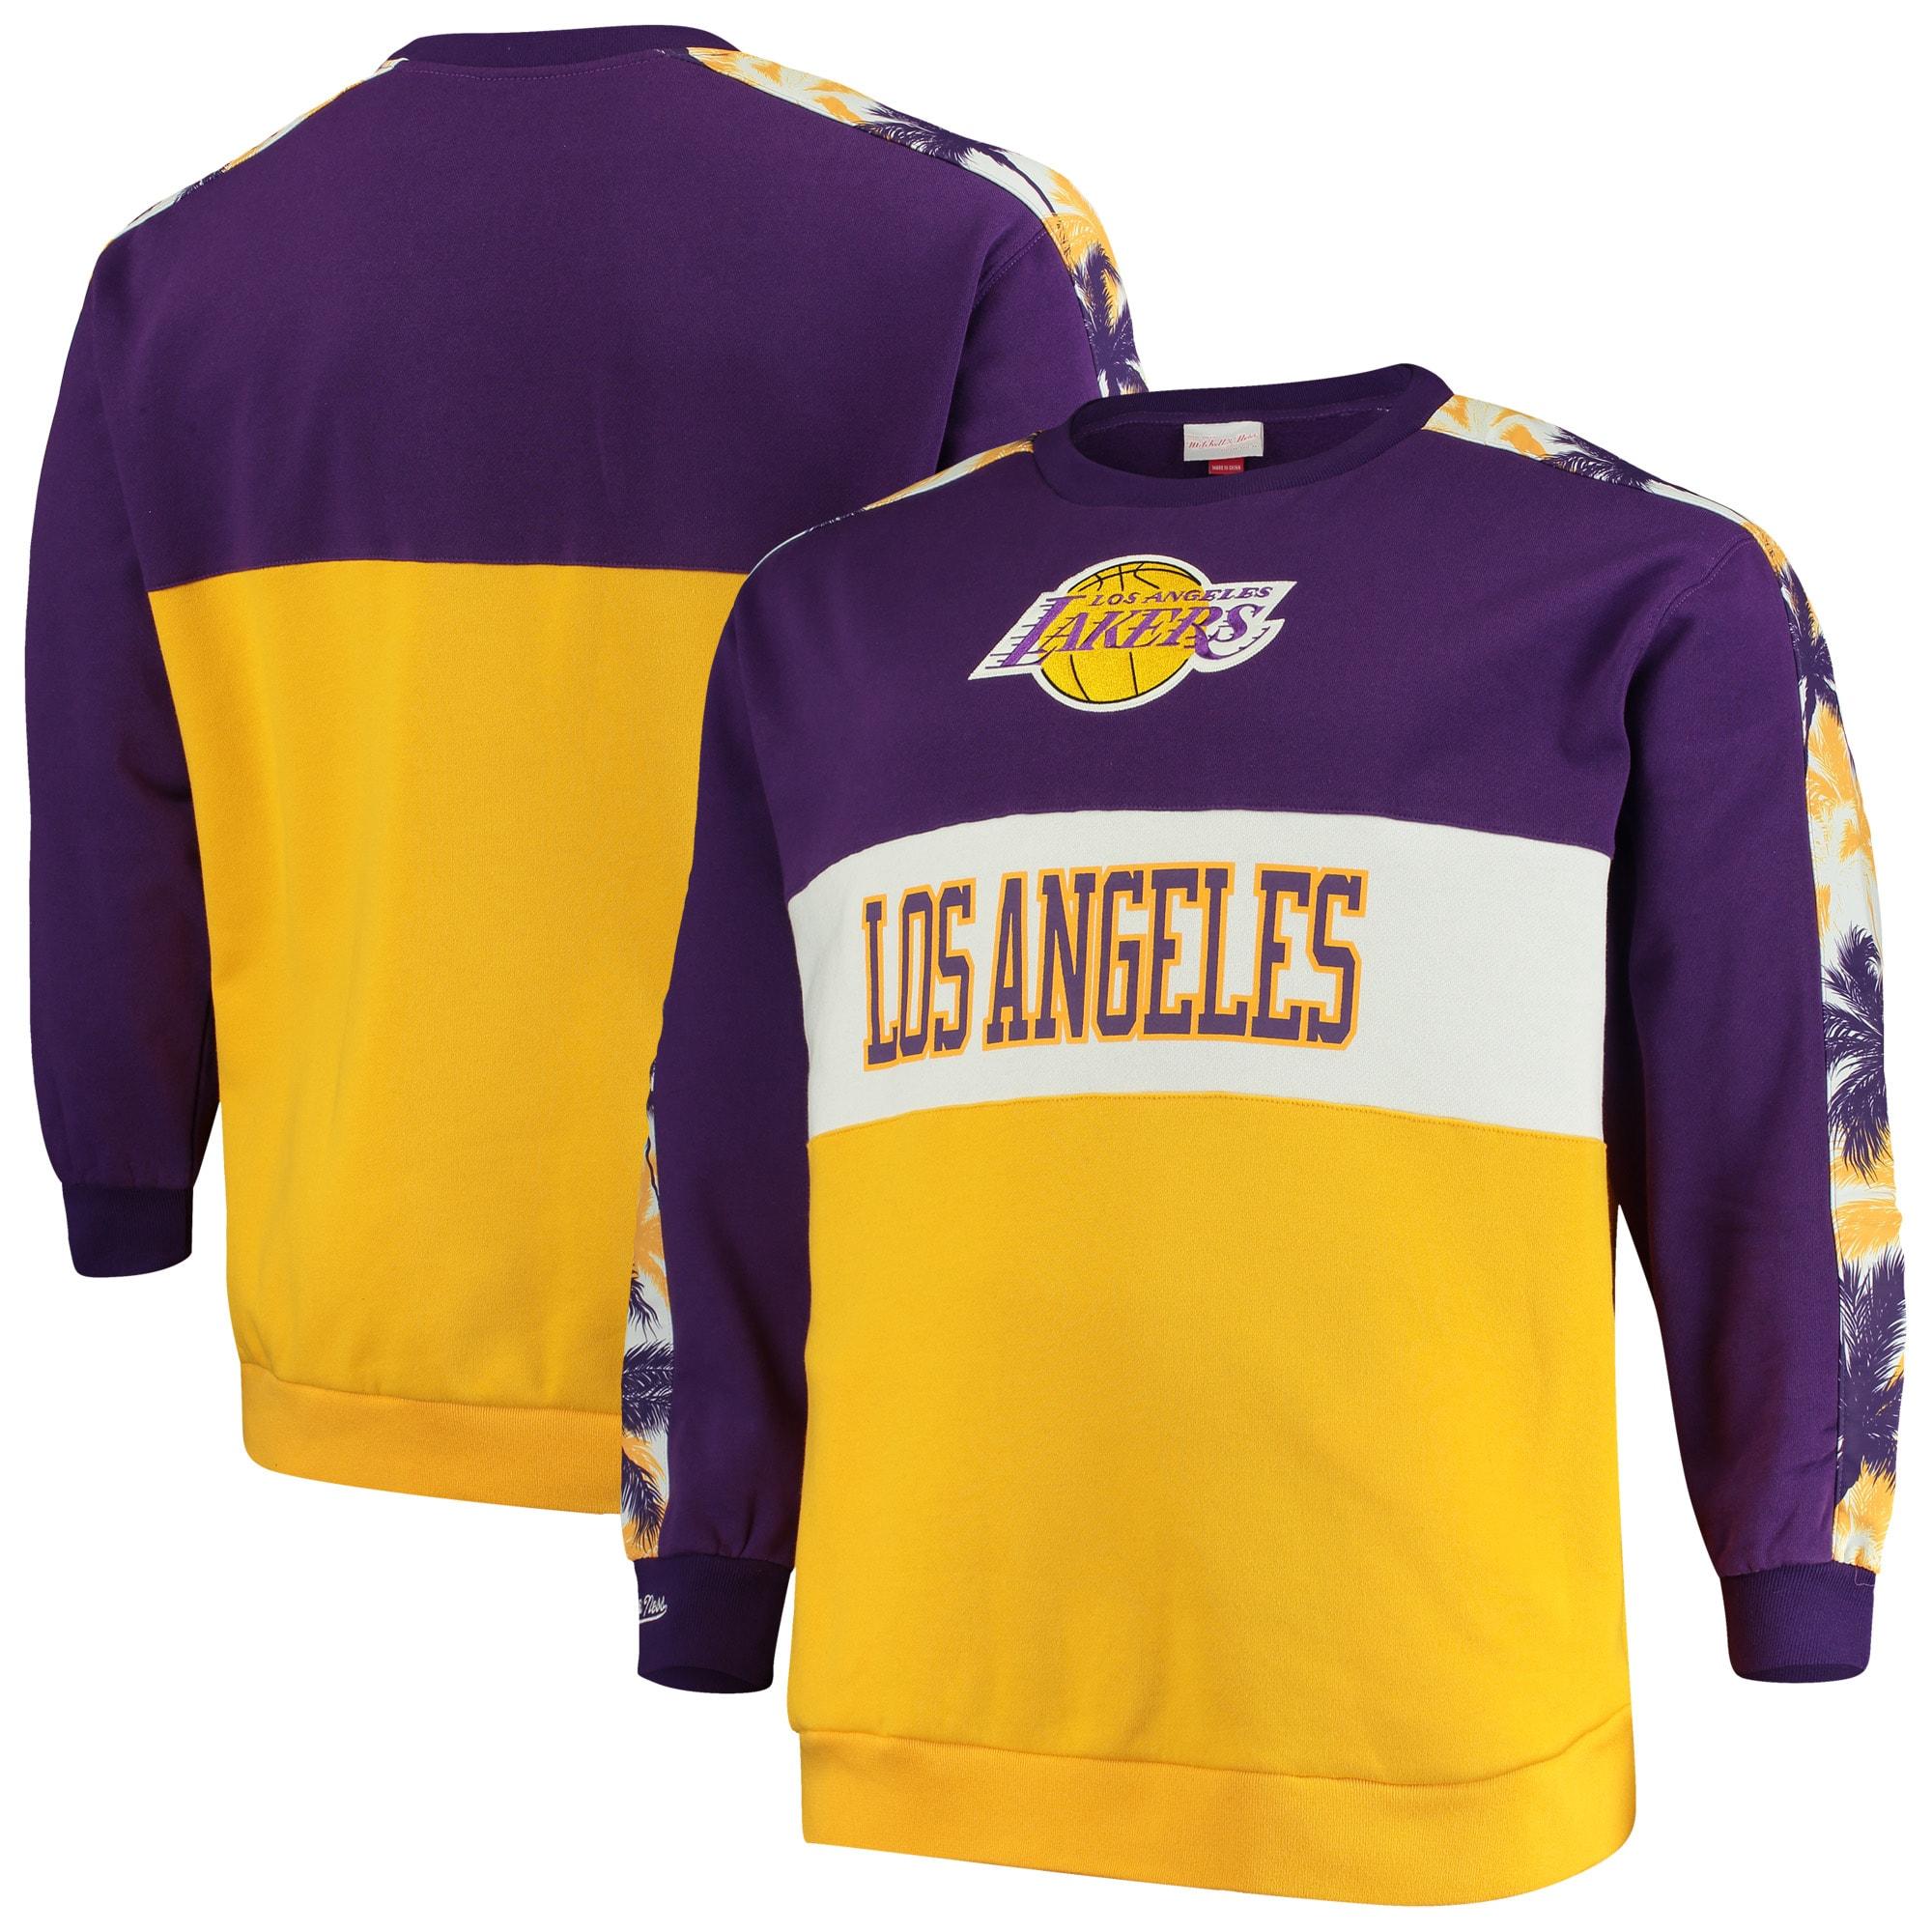 Los Angeles Lakers Mitchell & Ness Hardwood Classics Big & Tall Leading Scorer Fleece Pullover Sweatshirt - Purple/Gold